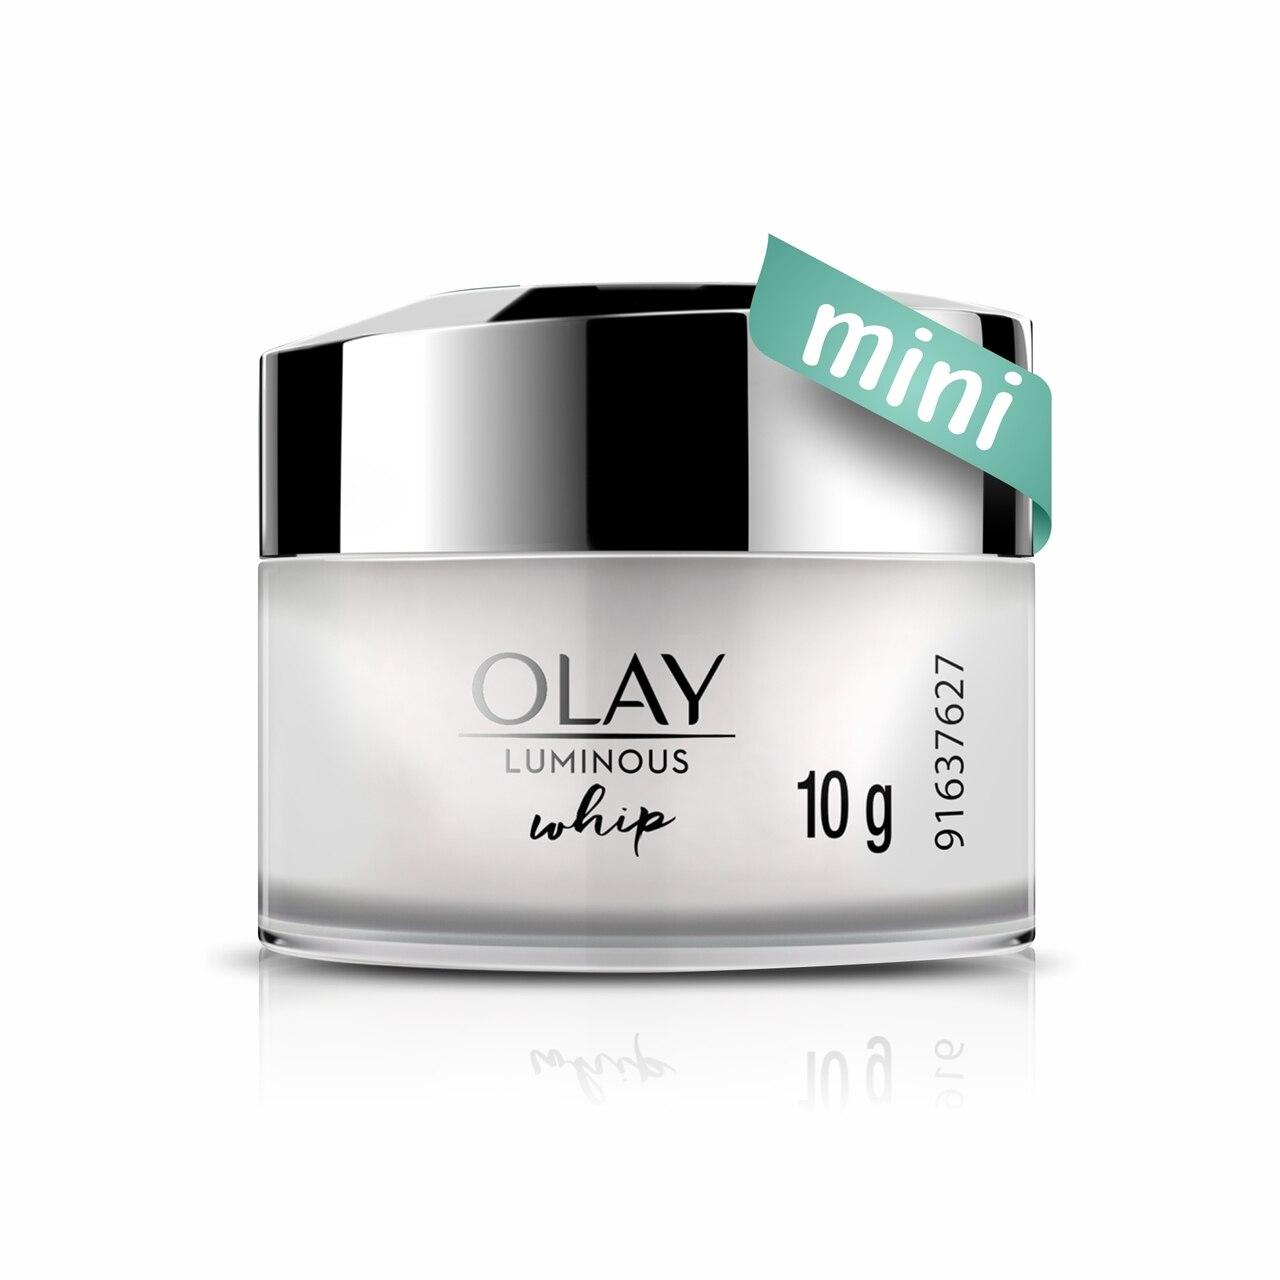 Olay Mini Luminous - Whip